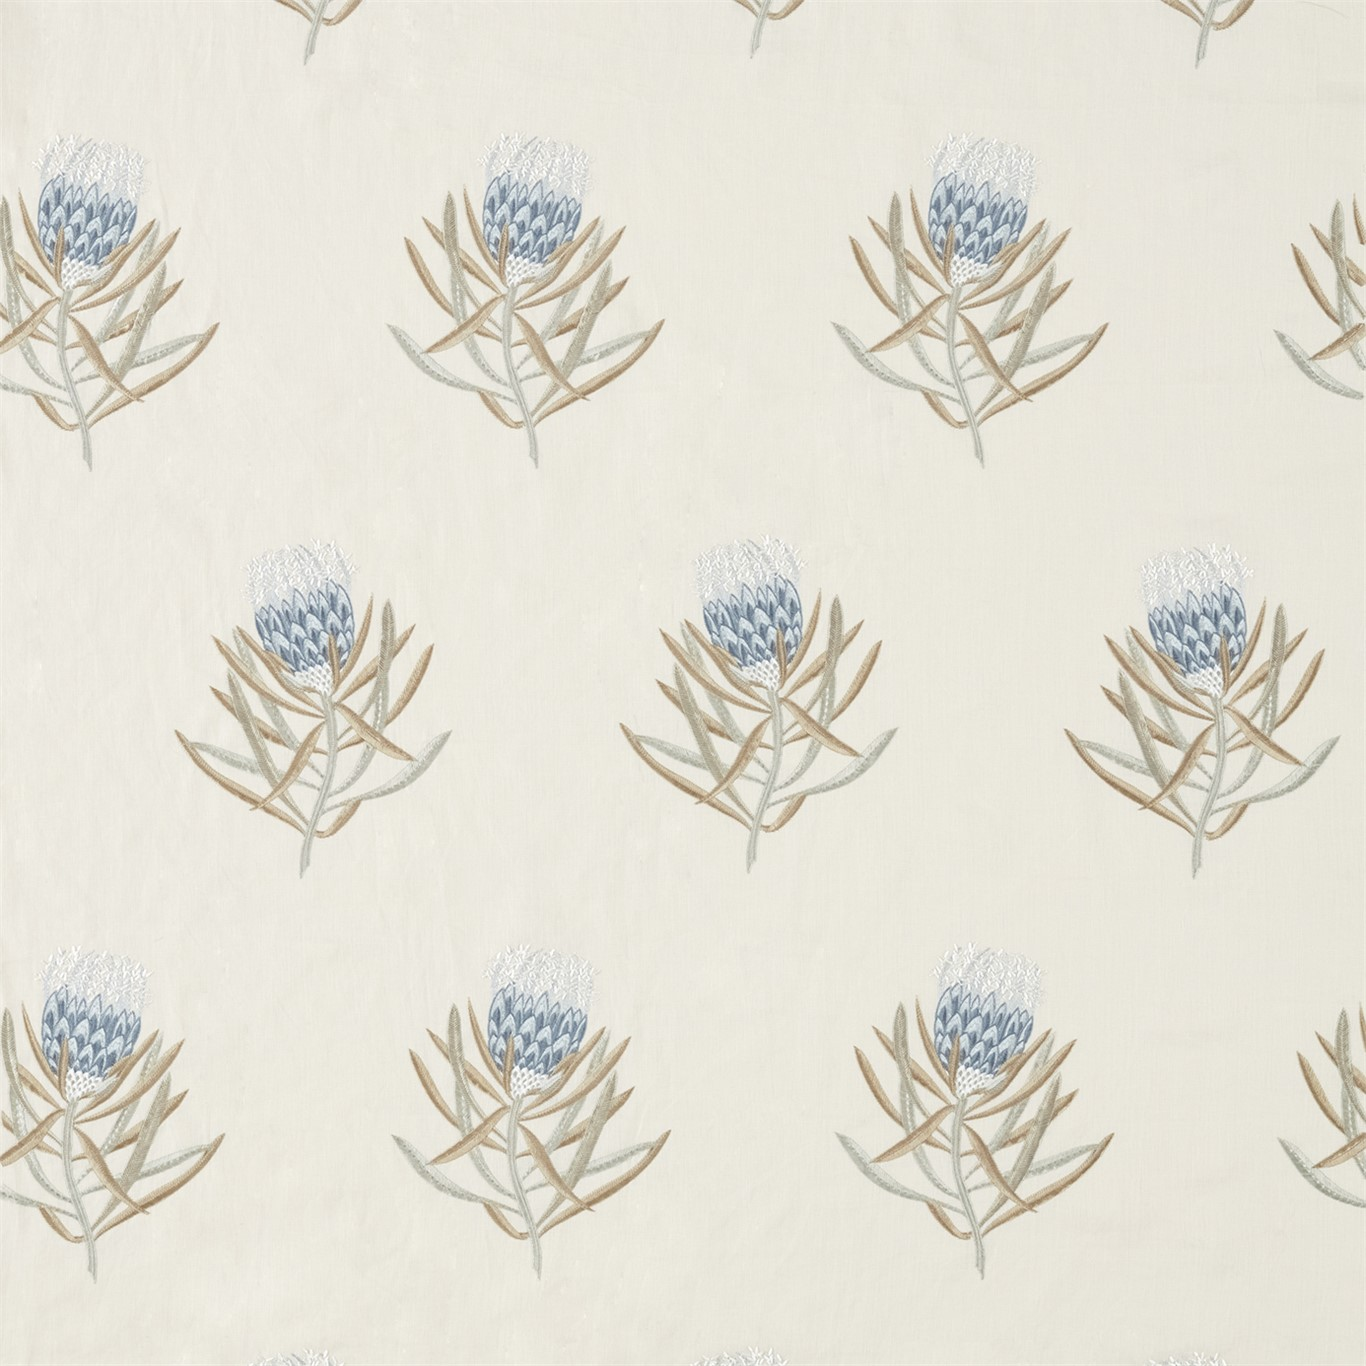 PROTEA FLOWER CHINA BLUE